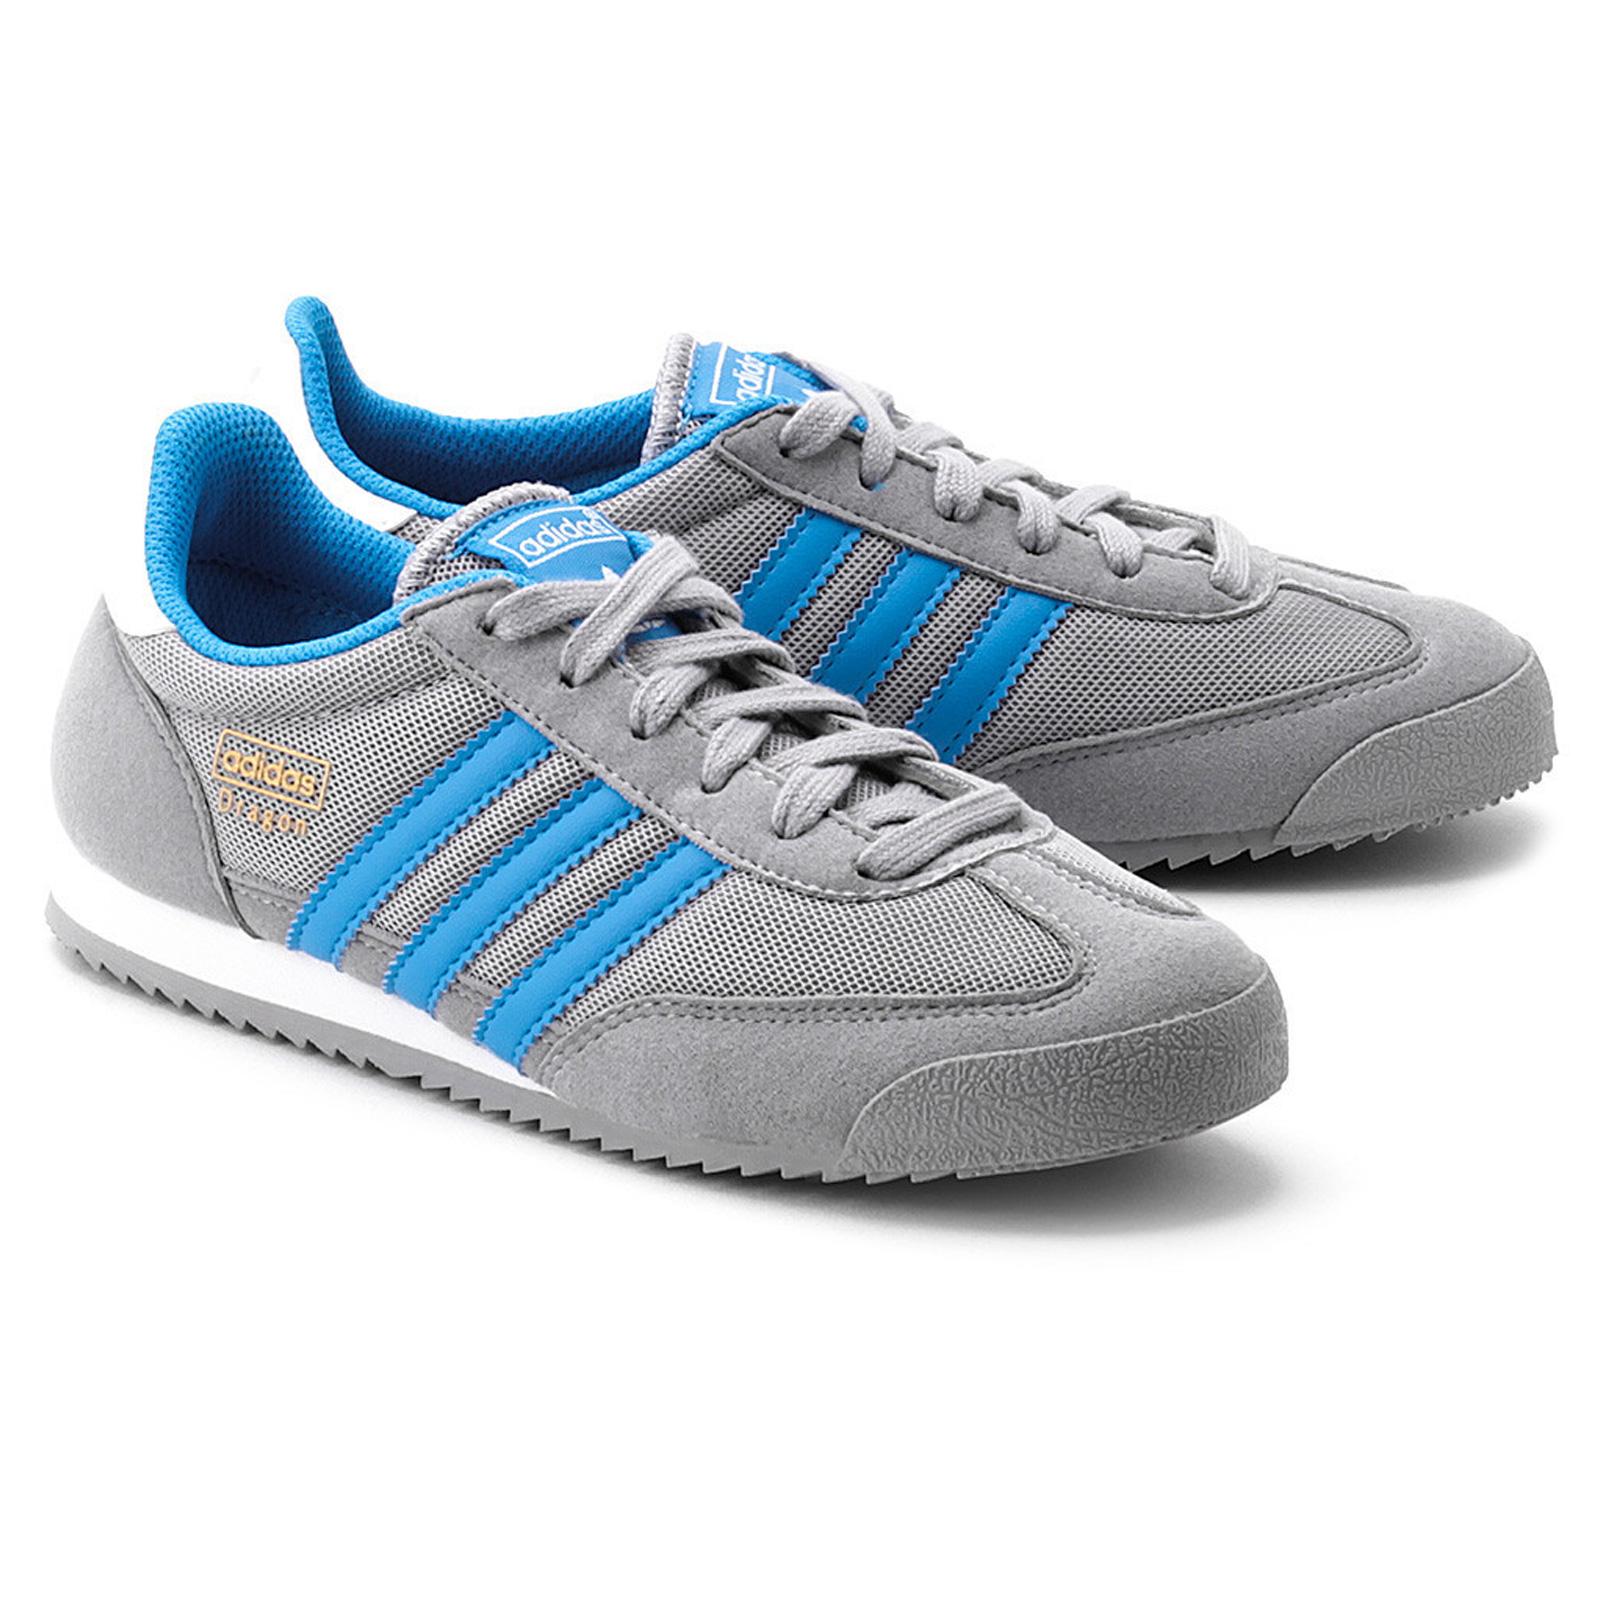 Details zu adidas Originals Dragon Schuhe Sneaker Leder Turnschuhe Klassiker Weiß Schwarz